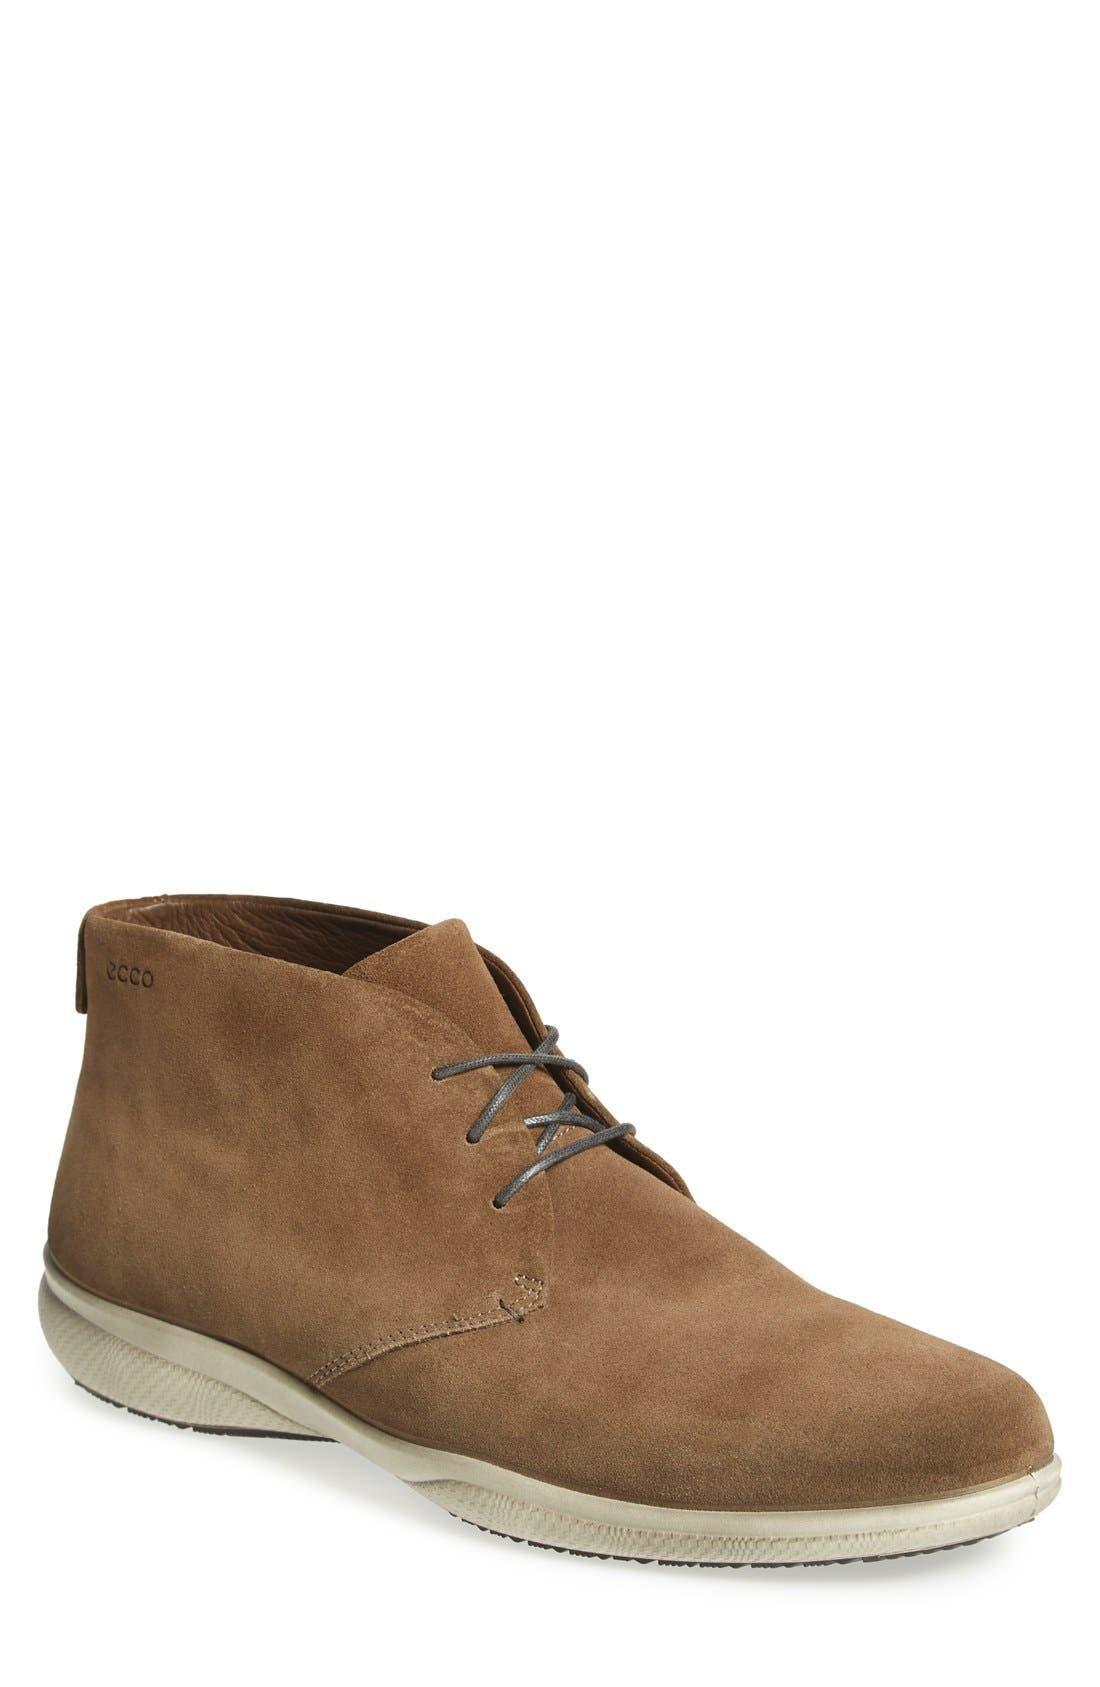 'Grenoble' Chukka Boot,                         Main,                         color, Birch Leather